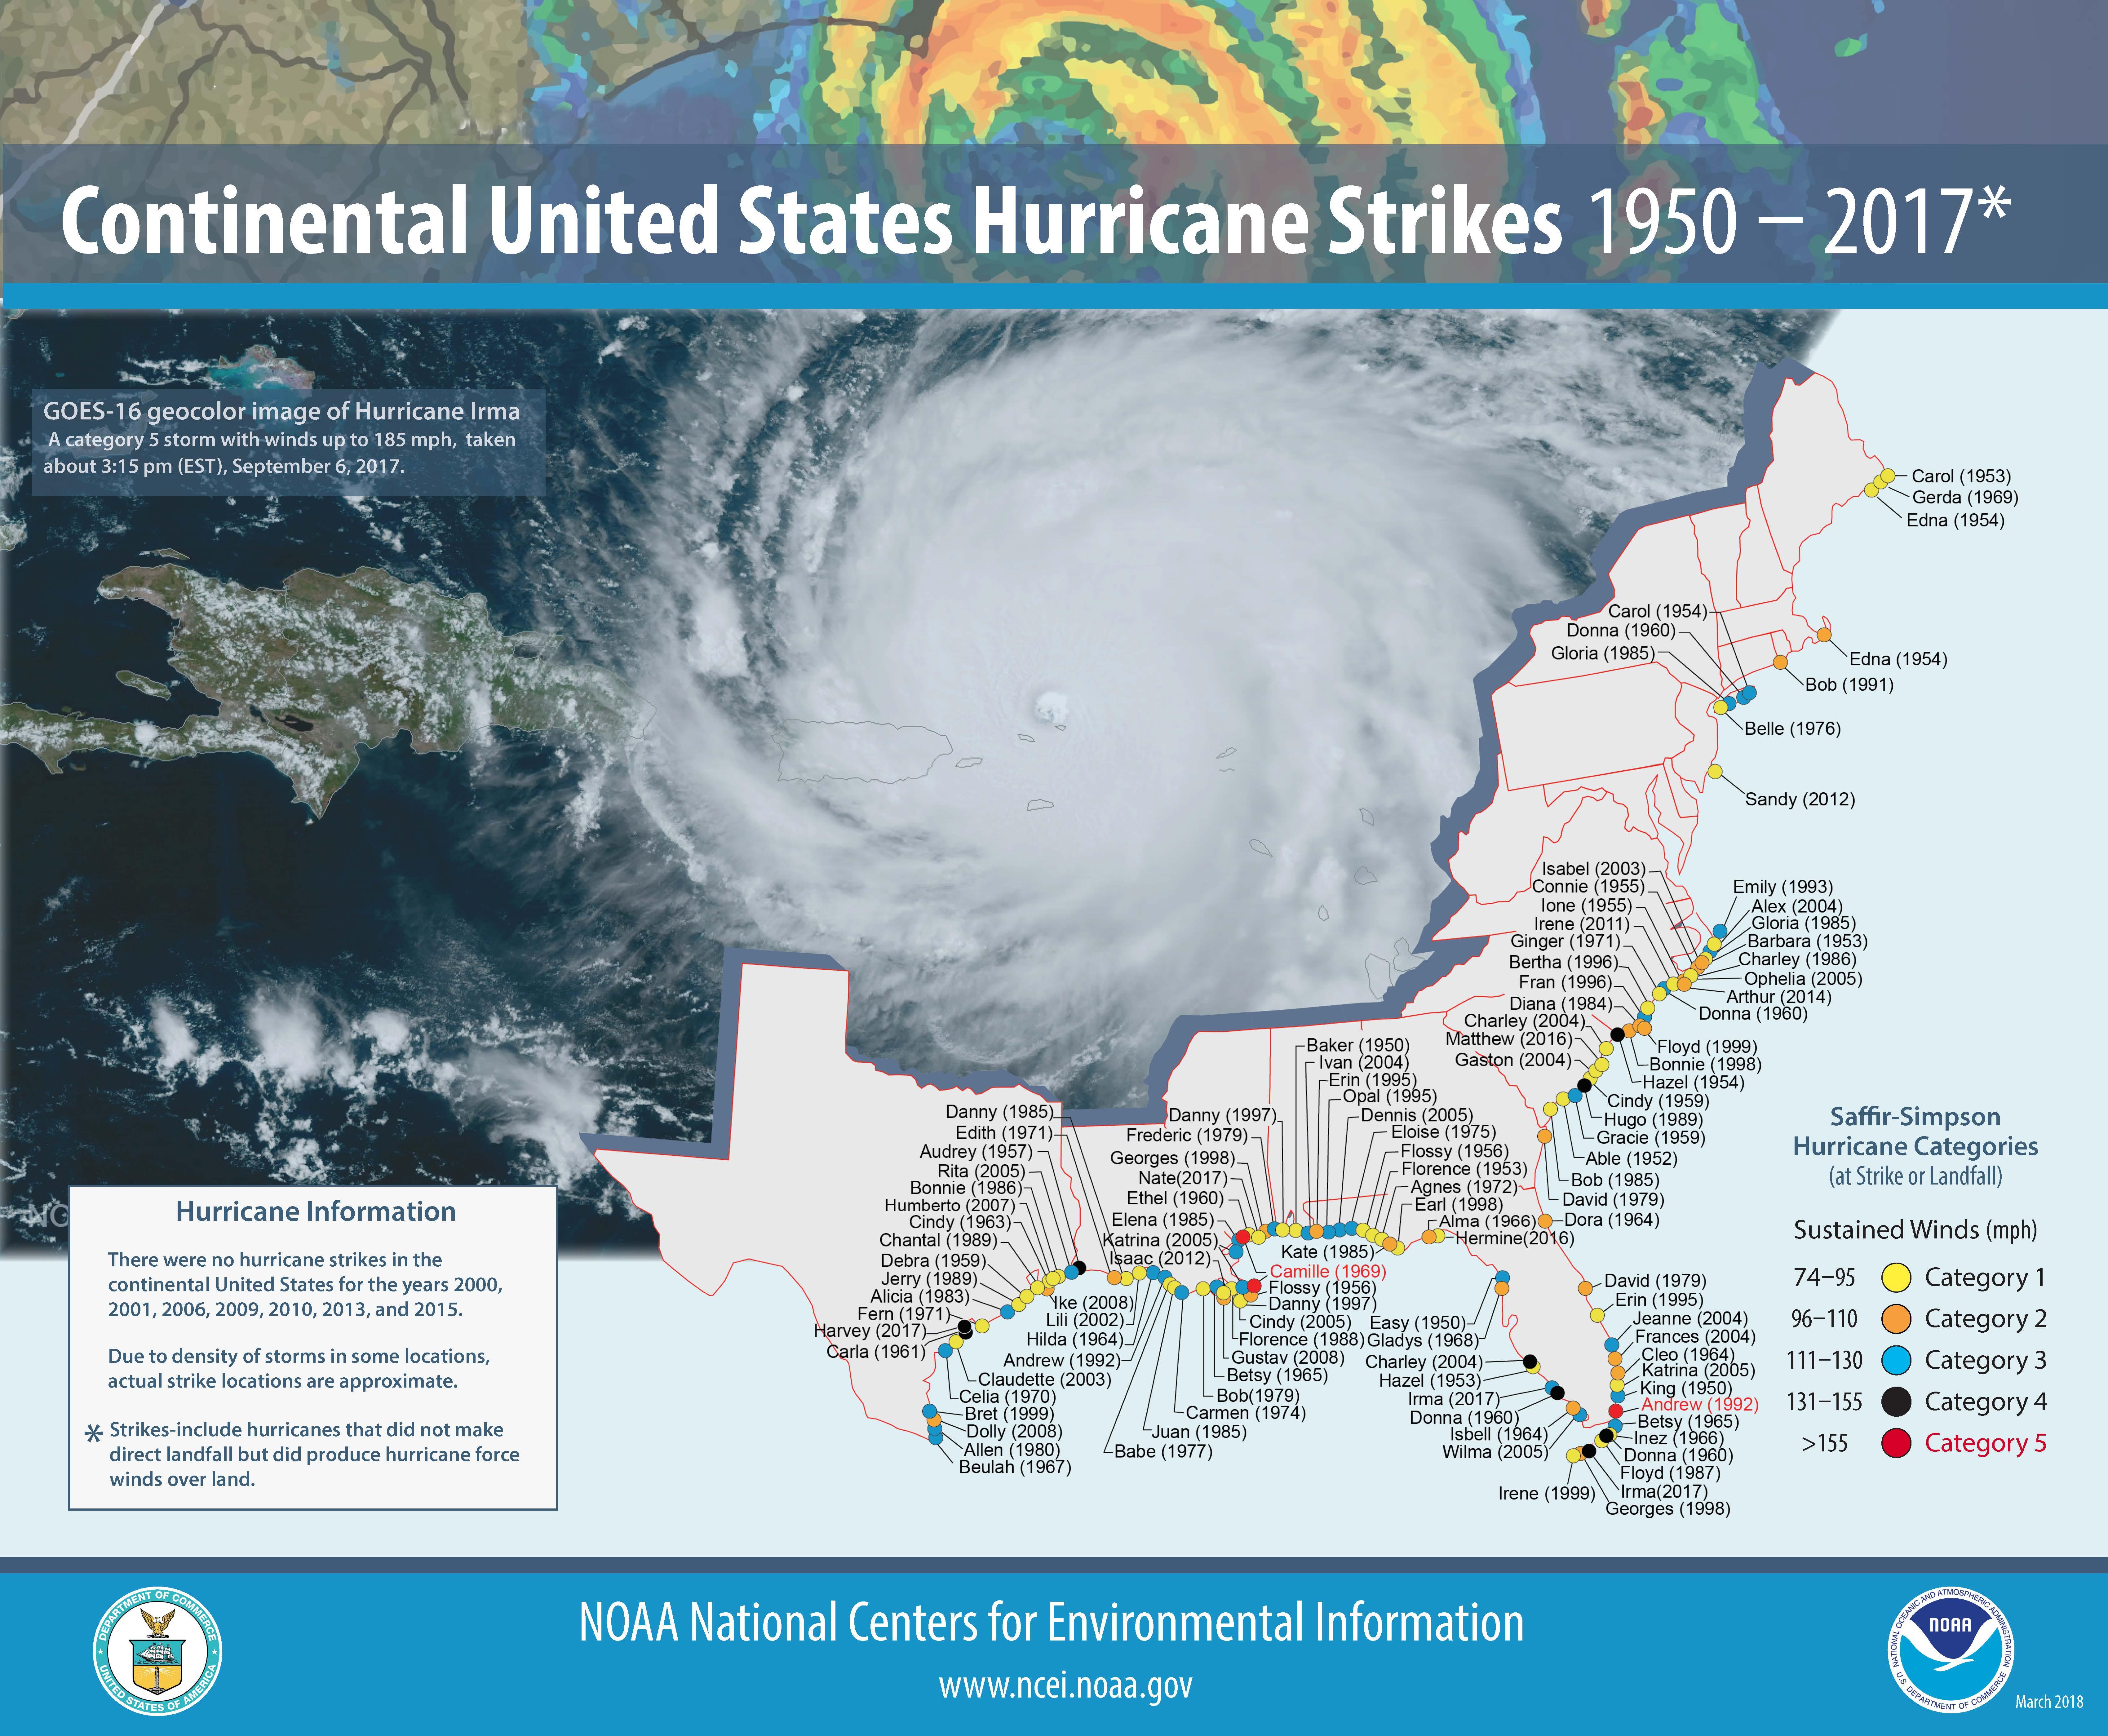 [Map of 1950-2017 CONUS Hurricane Strikes]